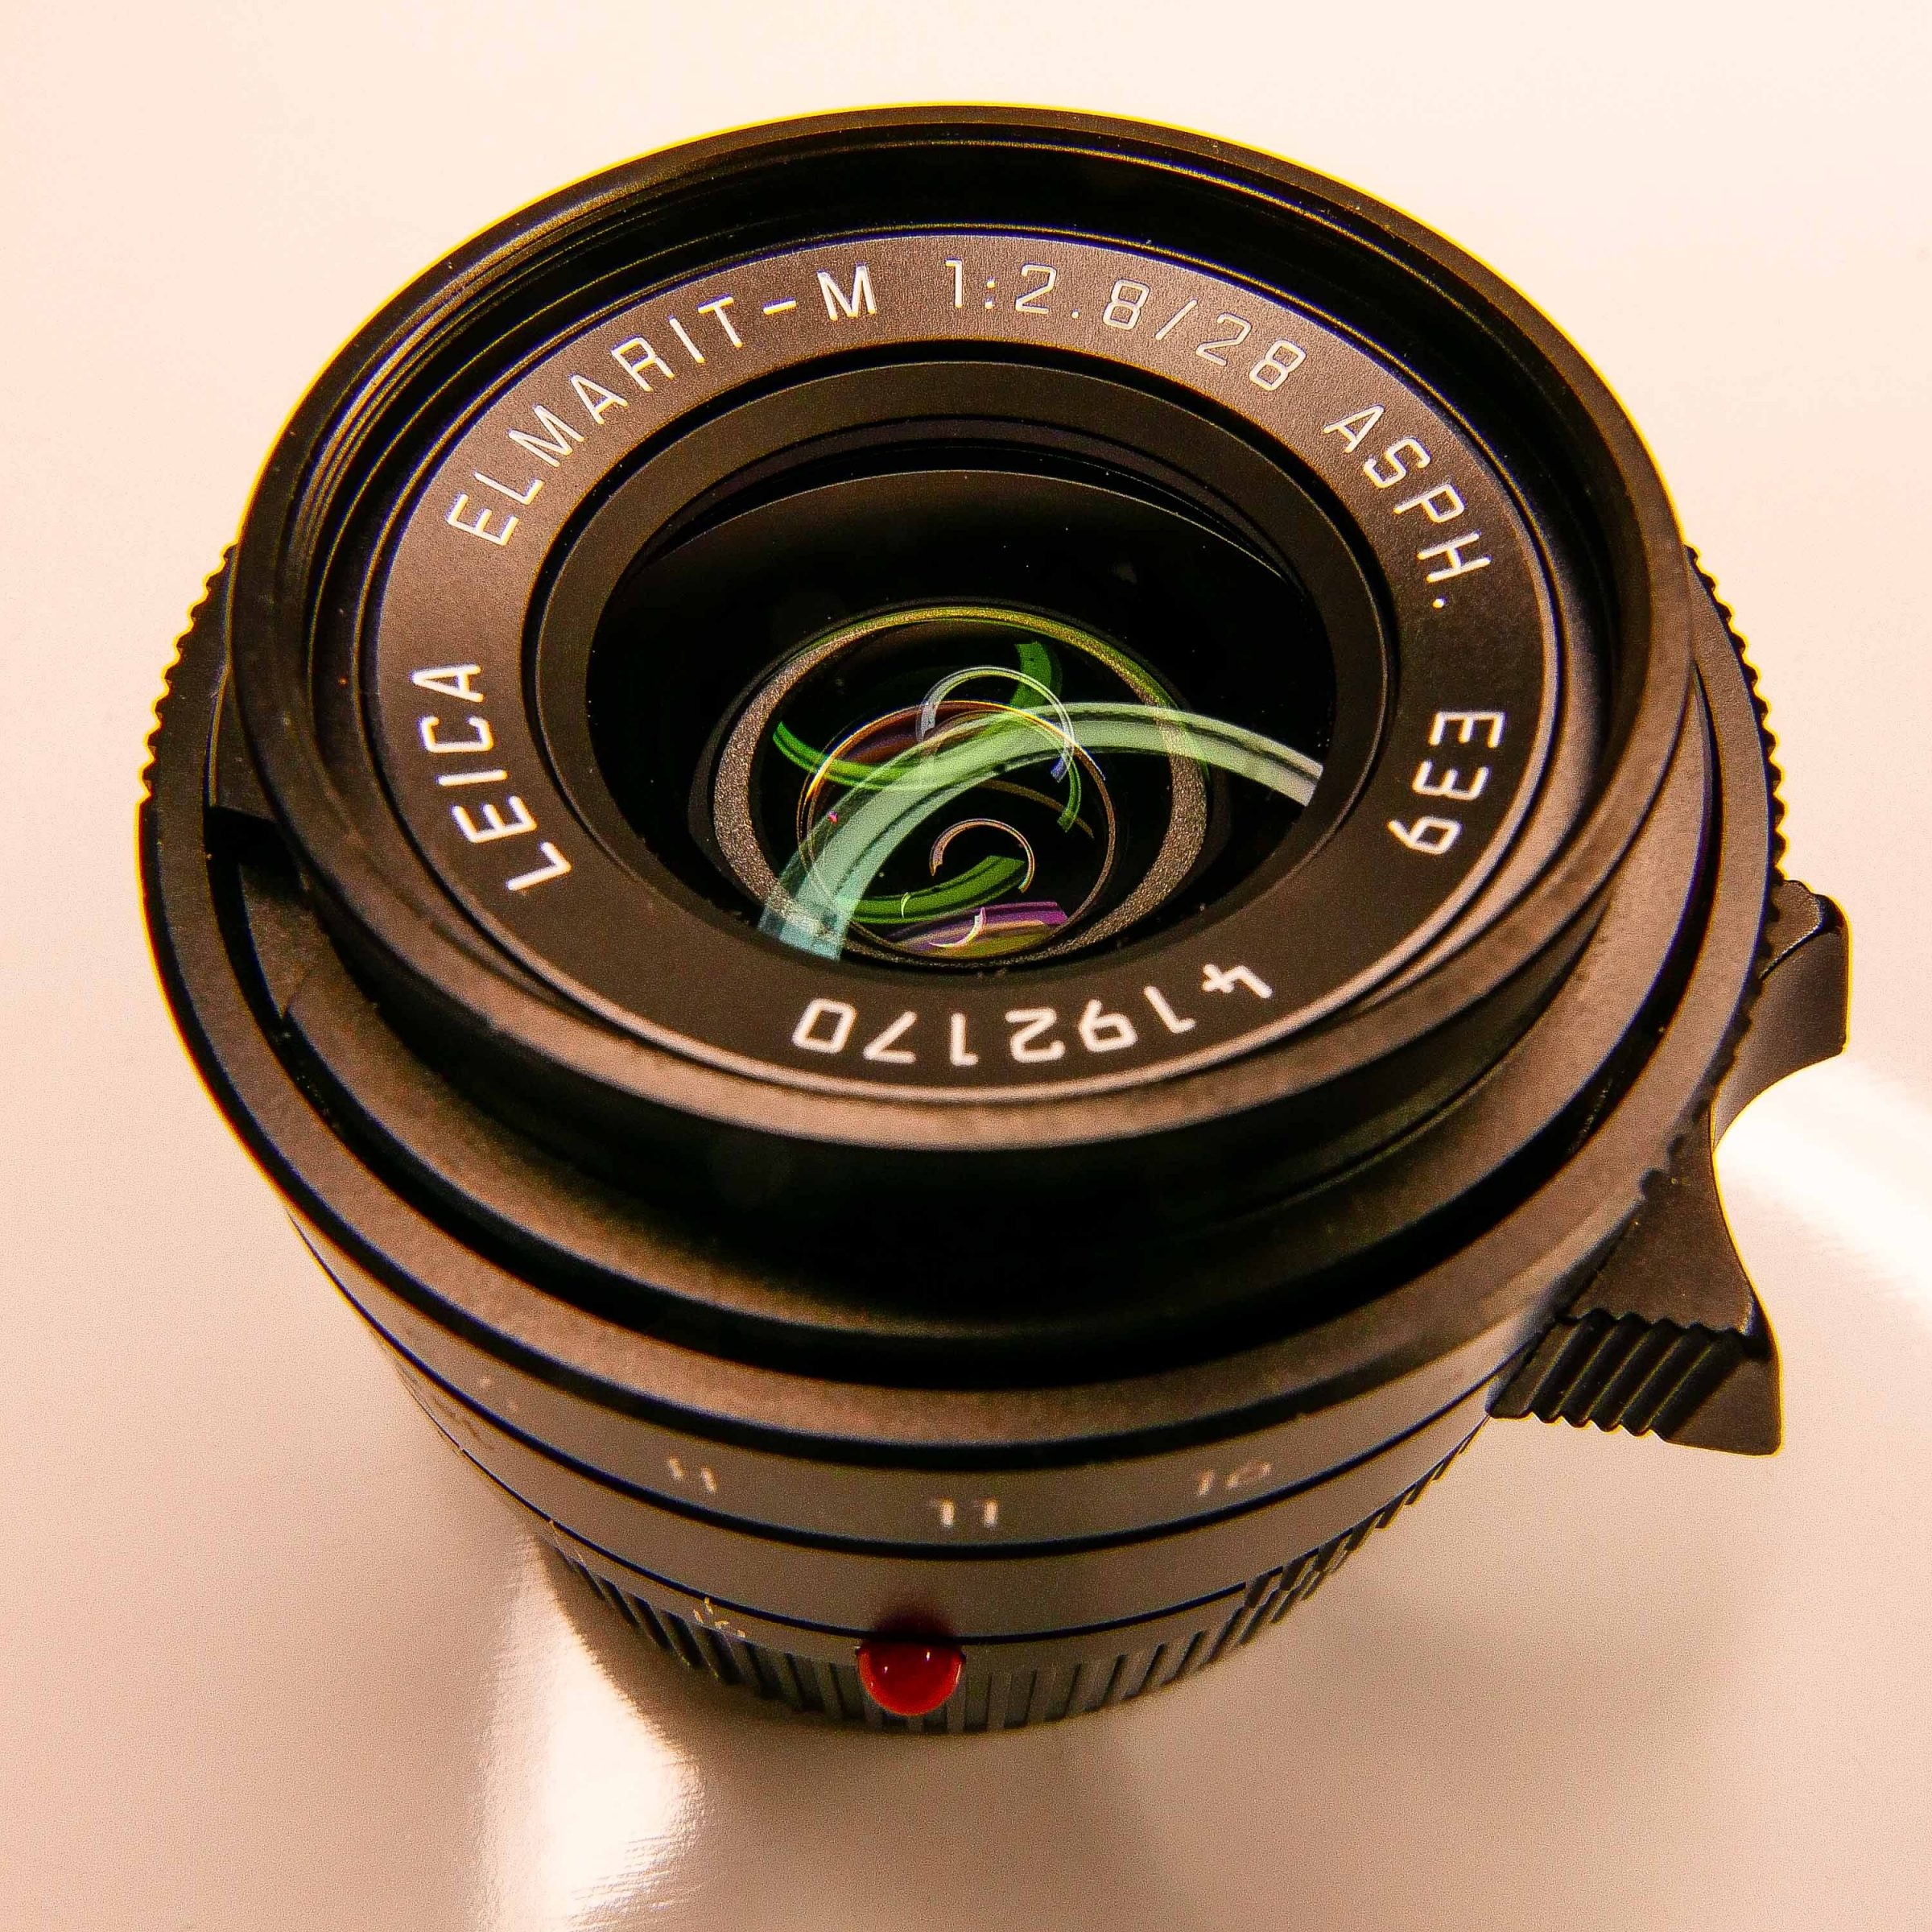 Leica Elmarit 28mm f2.8 ASPH lens review